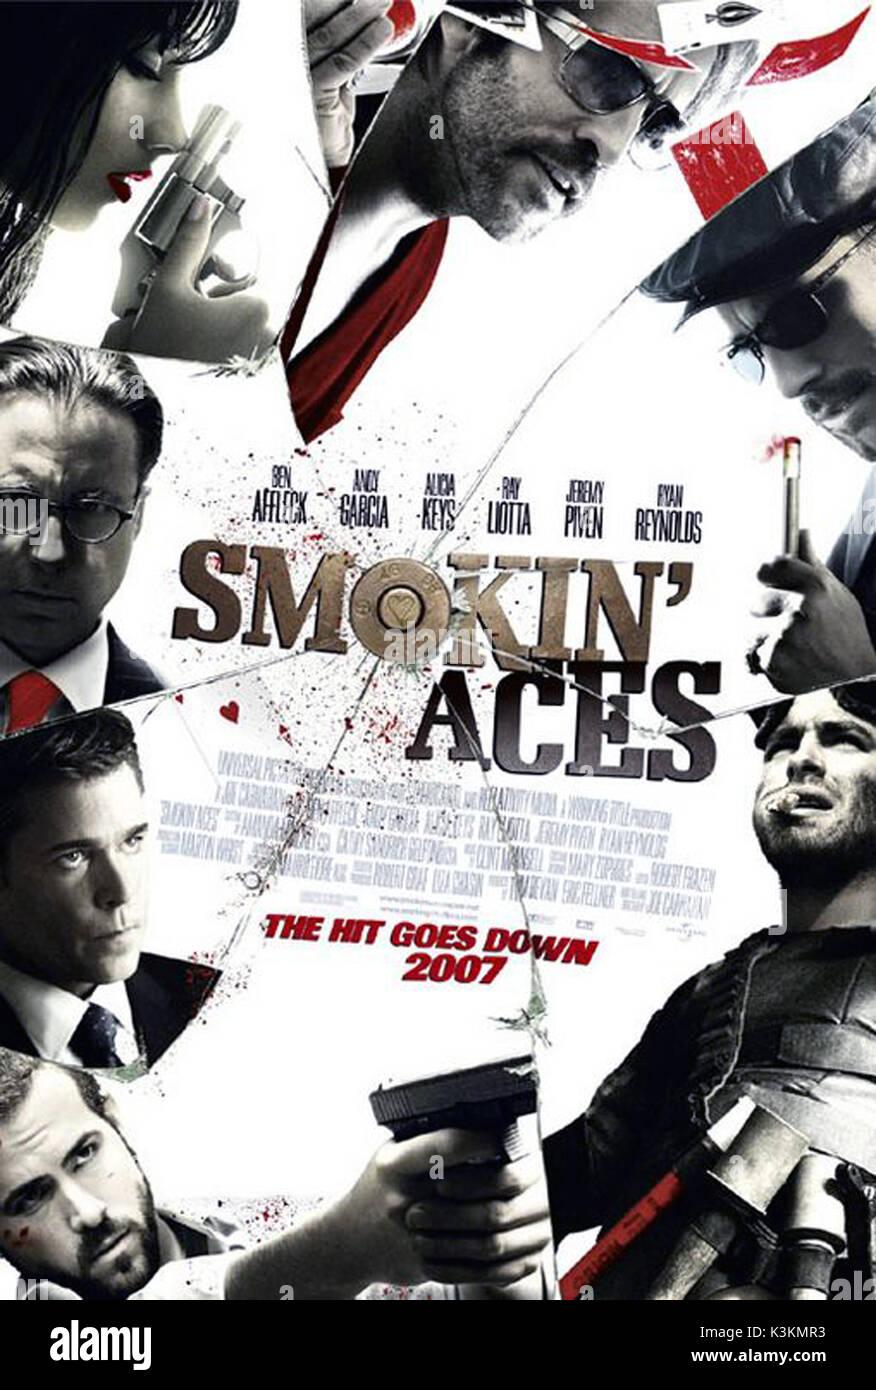 SMOKIN' ACES [BR / FR / US 2006]       Date: 2006 - Stock Image